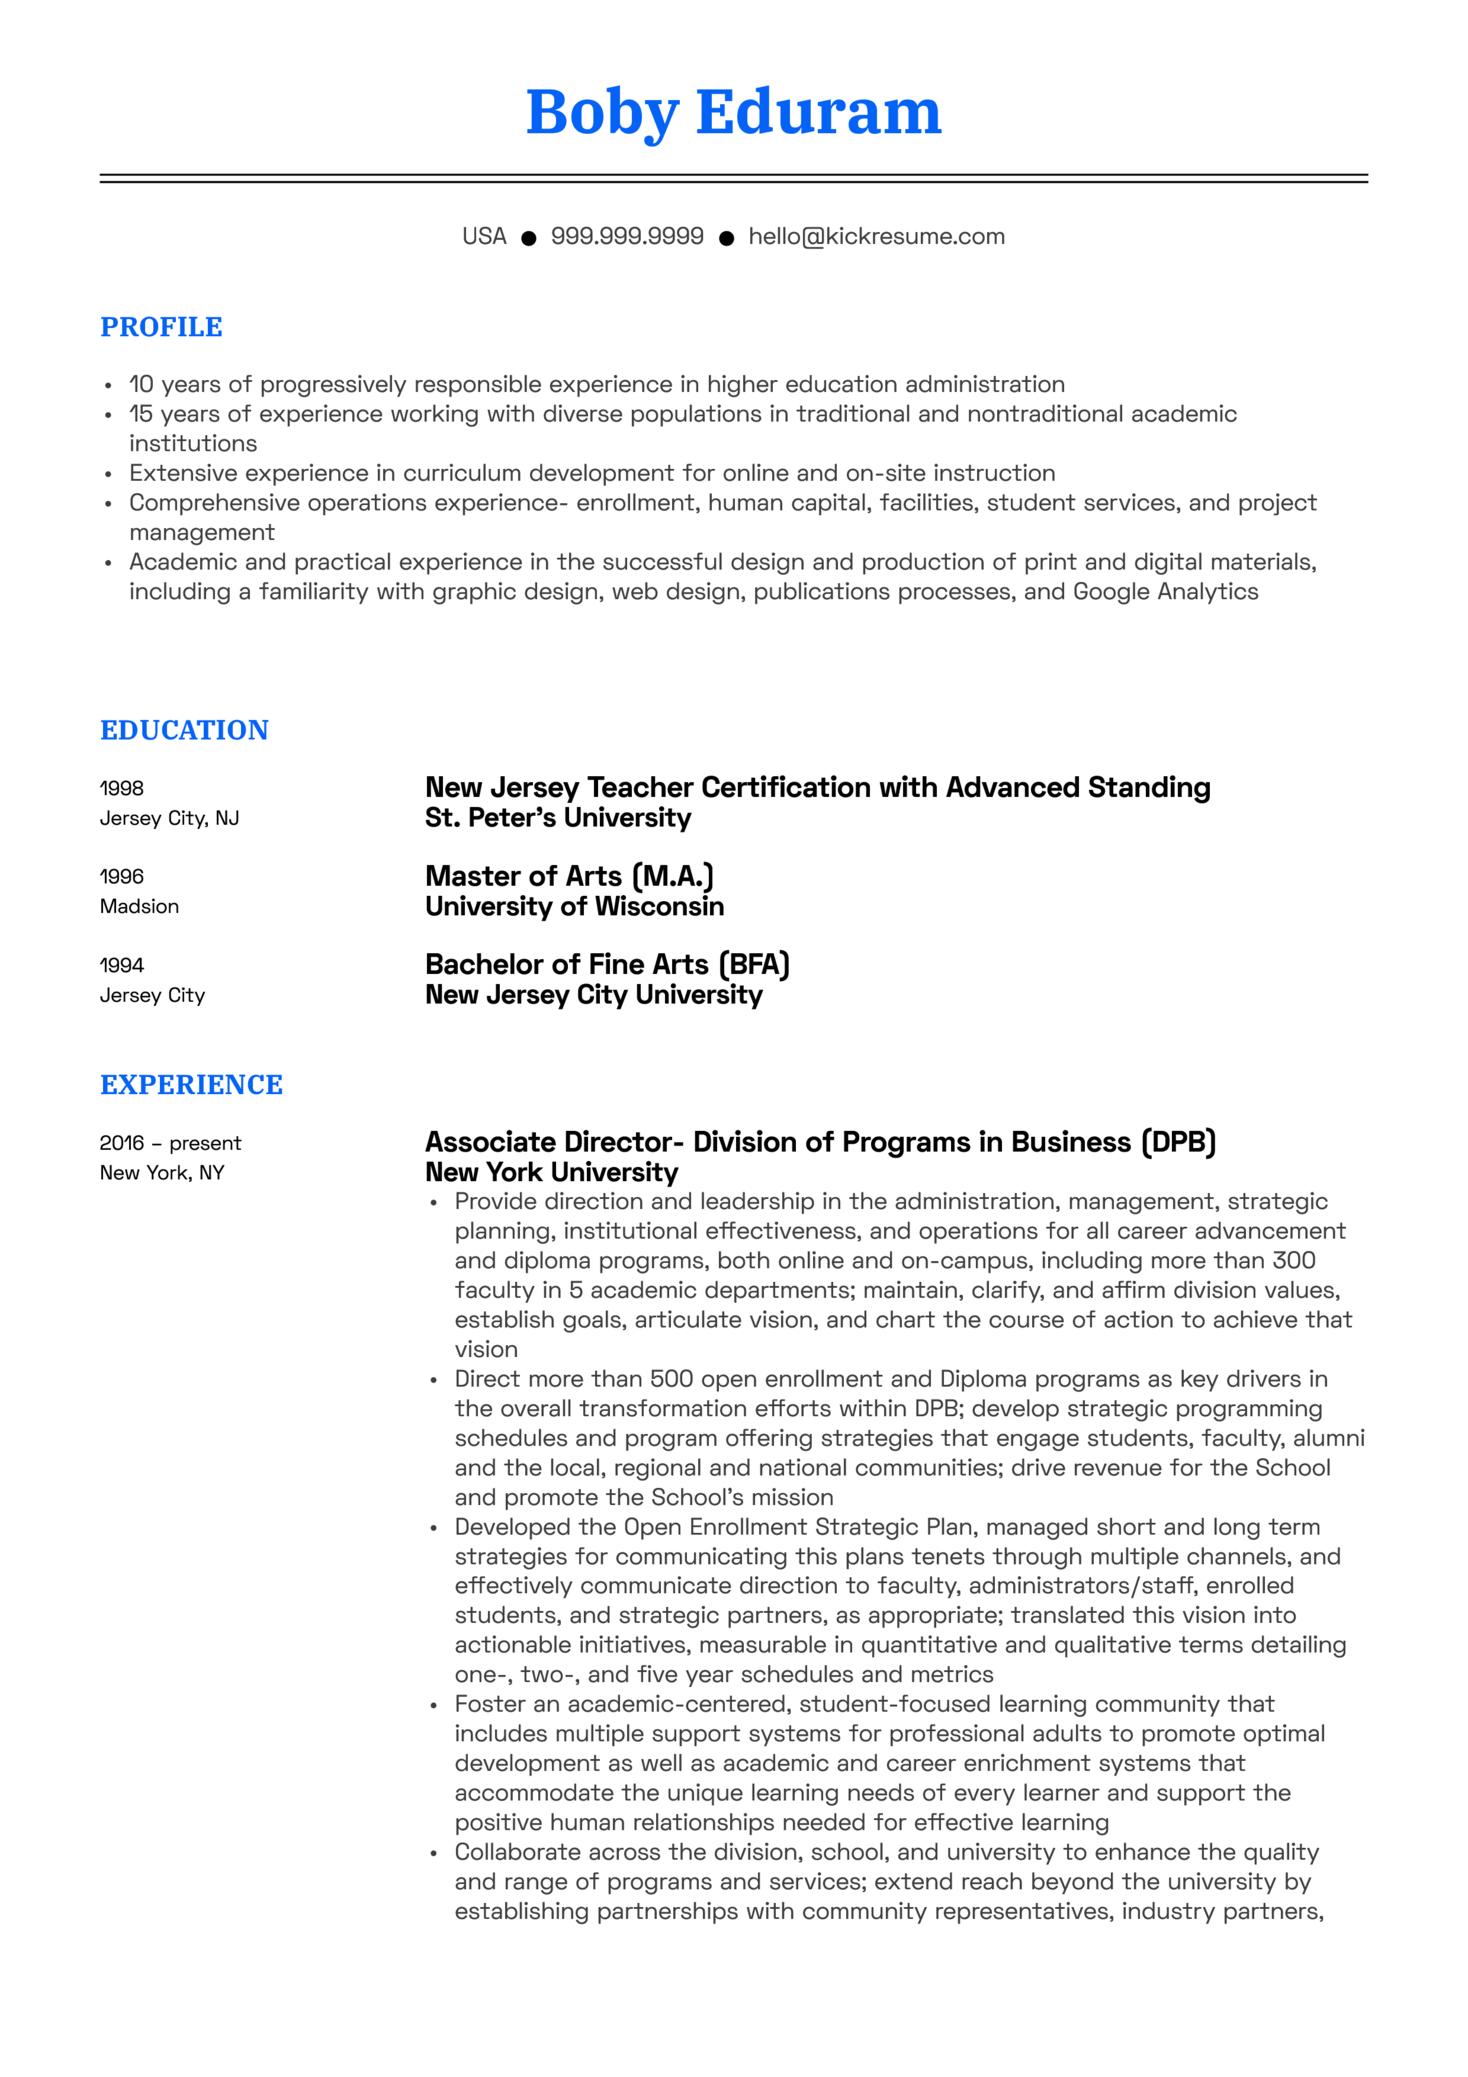 New York University Associate Director Resume Sample (Part 1)